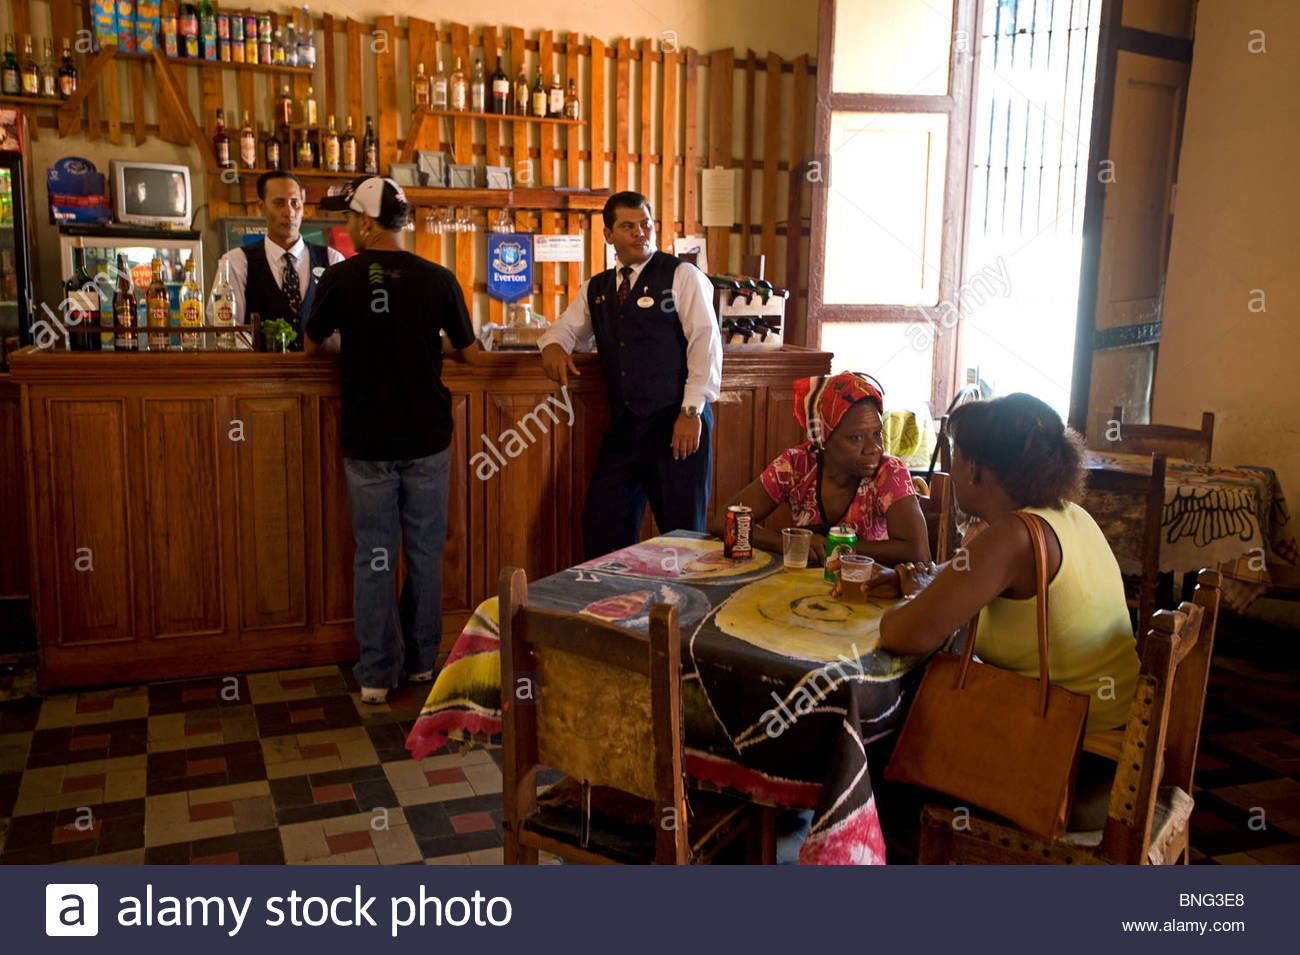 Patio artex cafe,Santiago de Cuba, Cuba Photo Stock